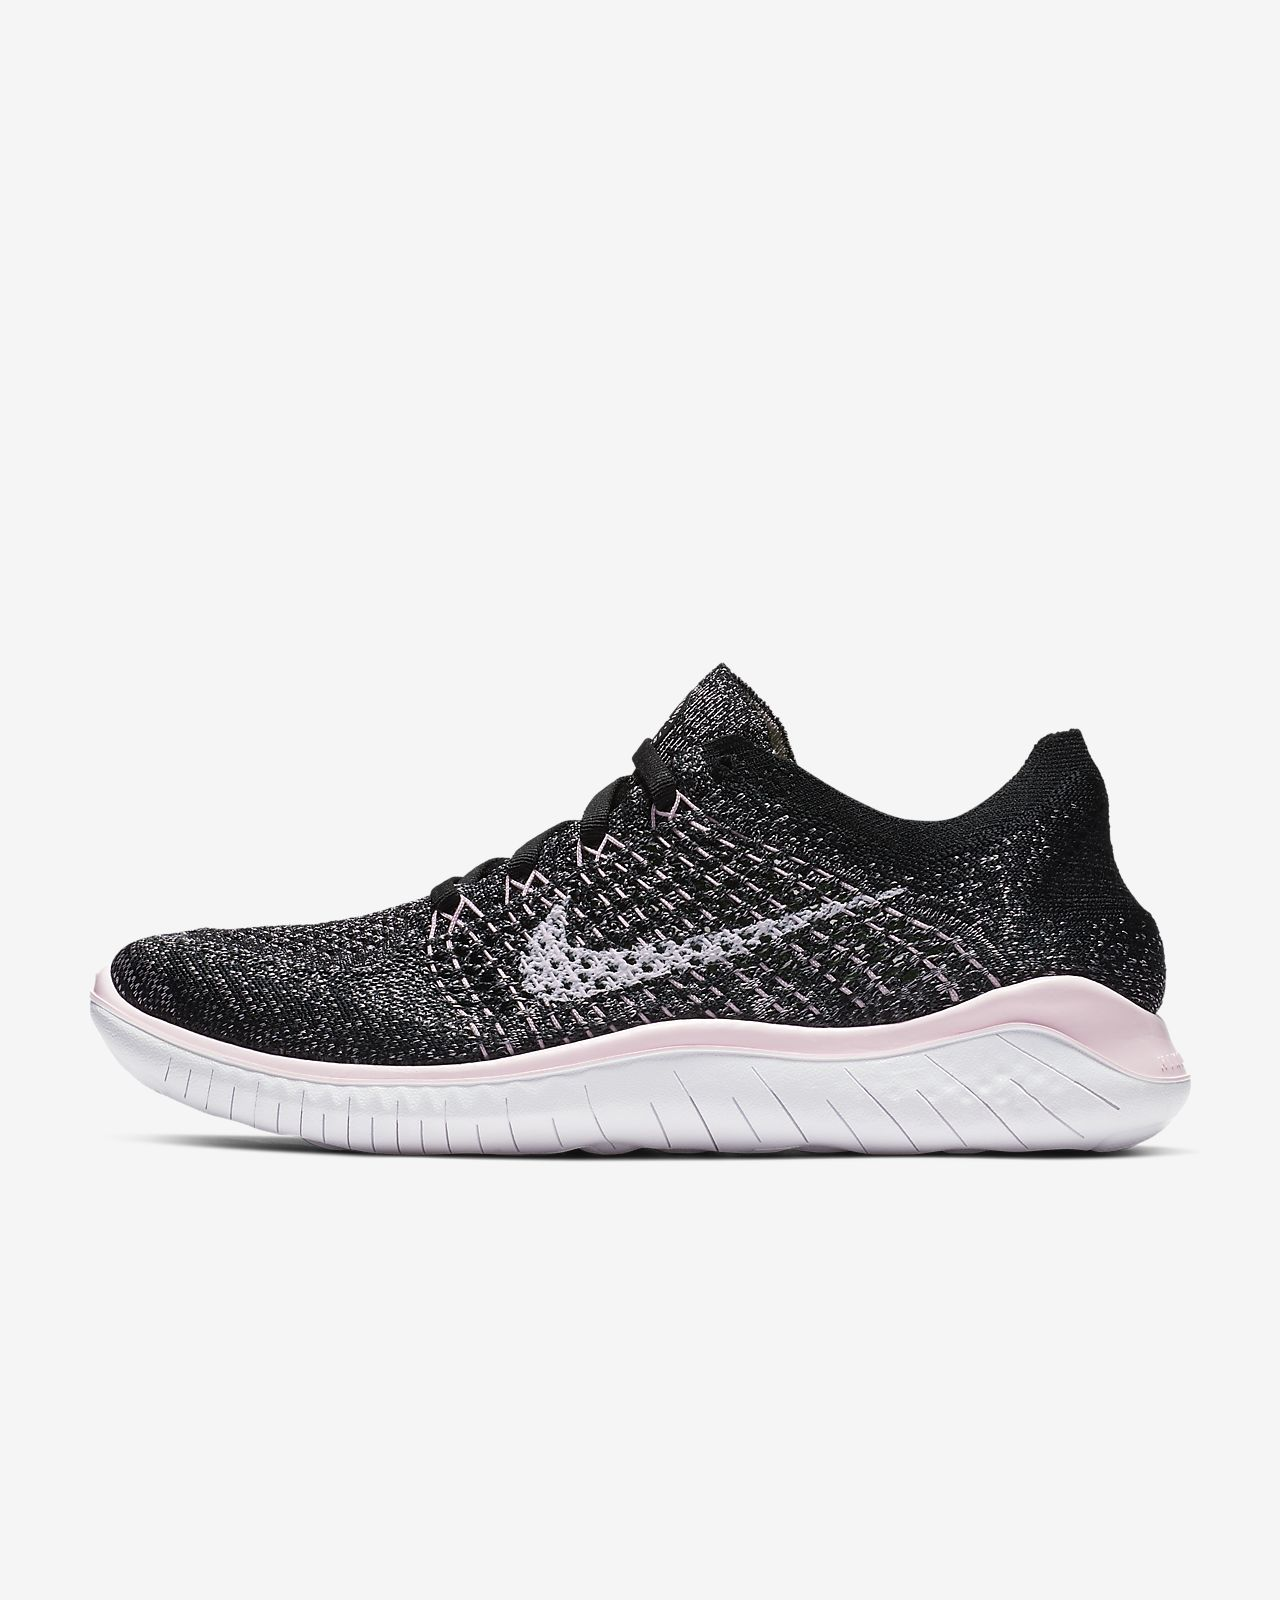 acce252f1ad34 Nike Free RN Flyknit 2018 Women s Running Shoe. Nike.com